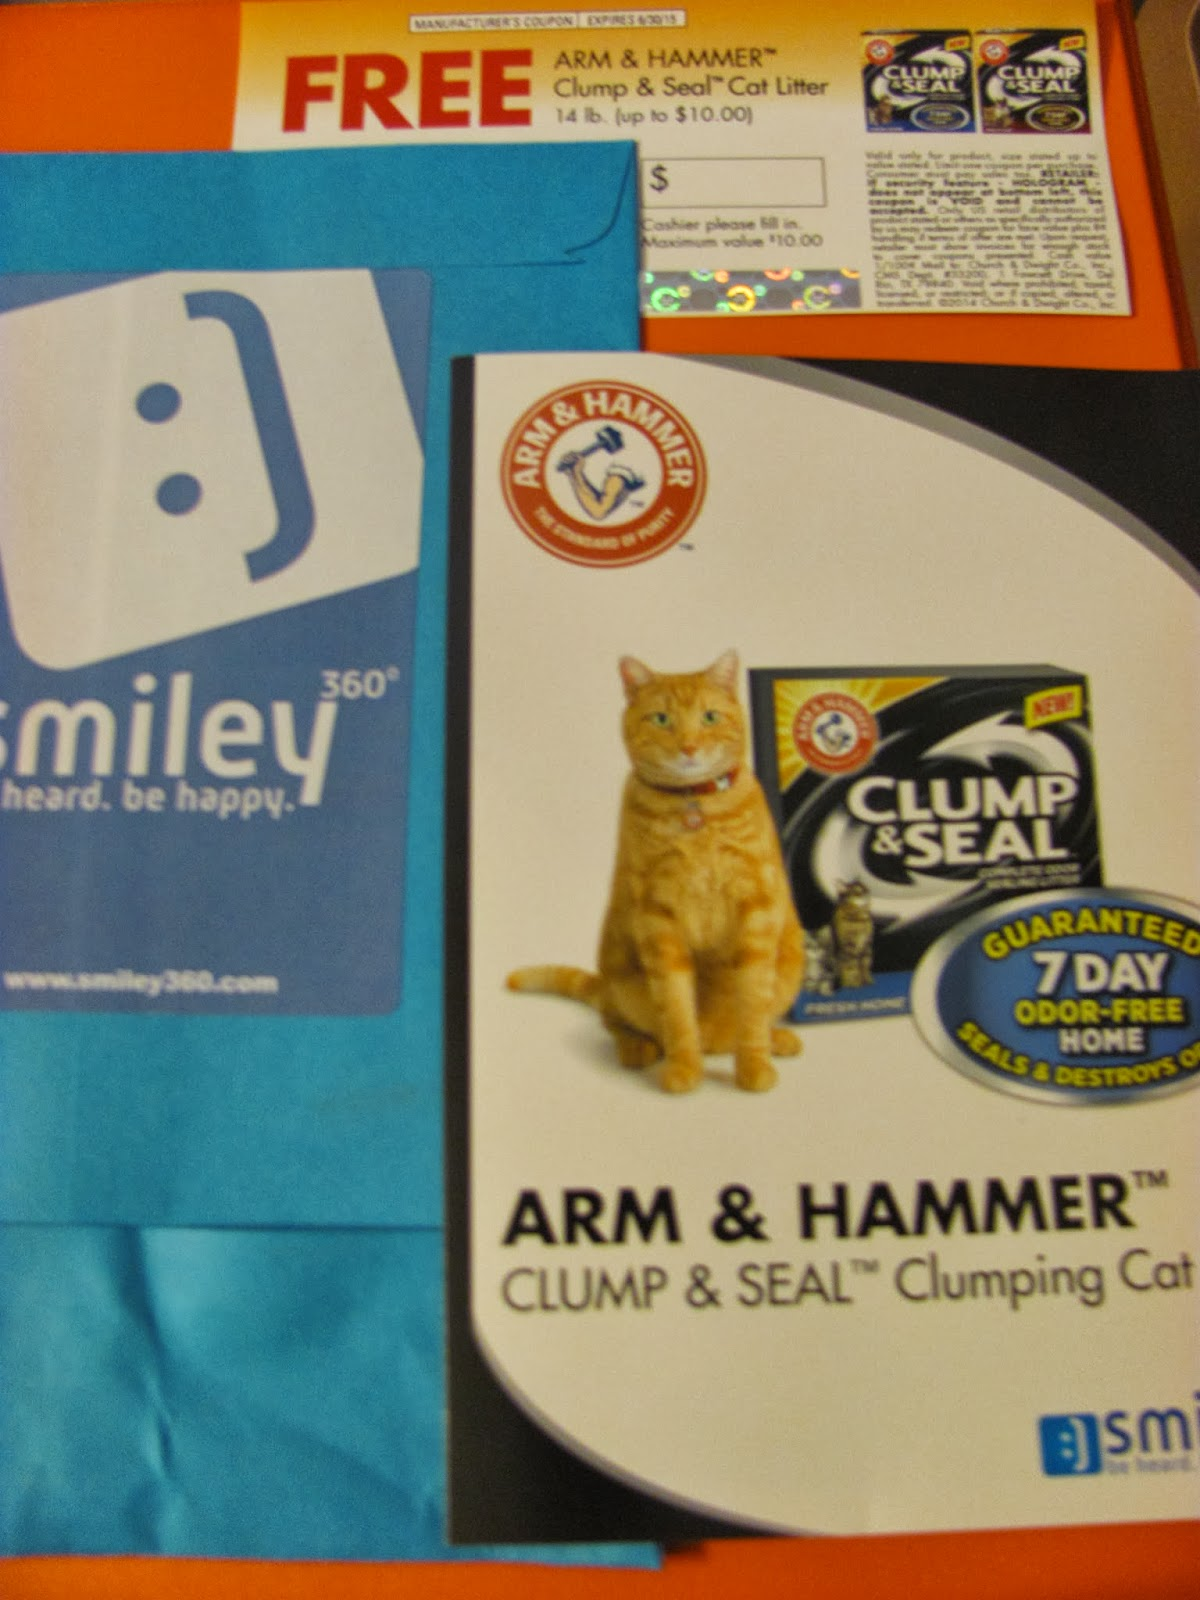 Armandhammer com coupons